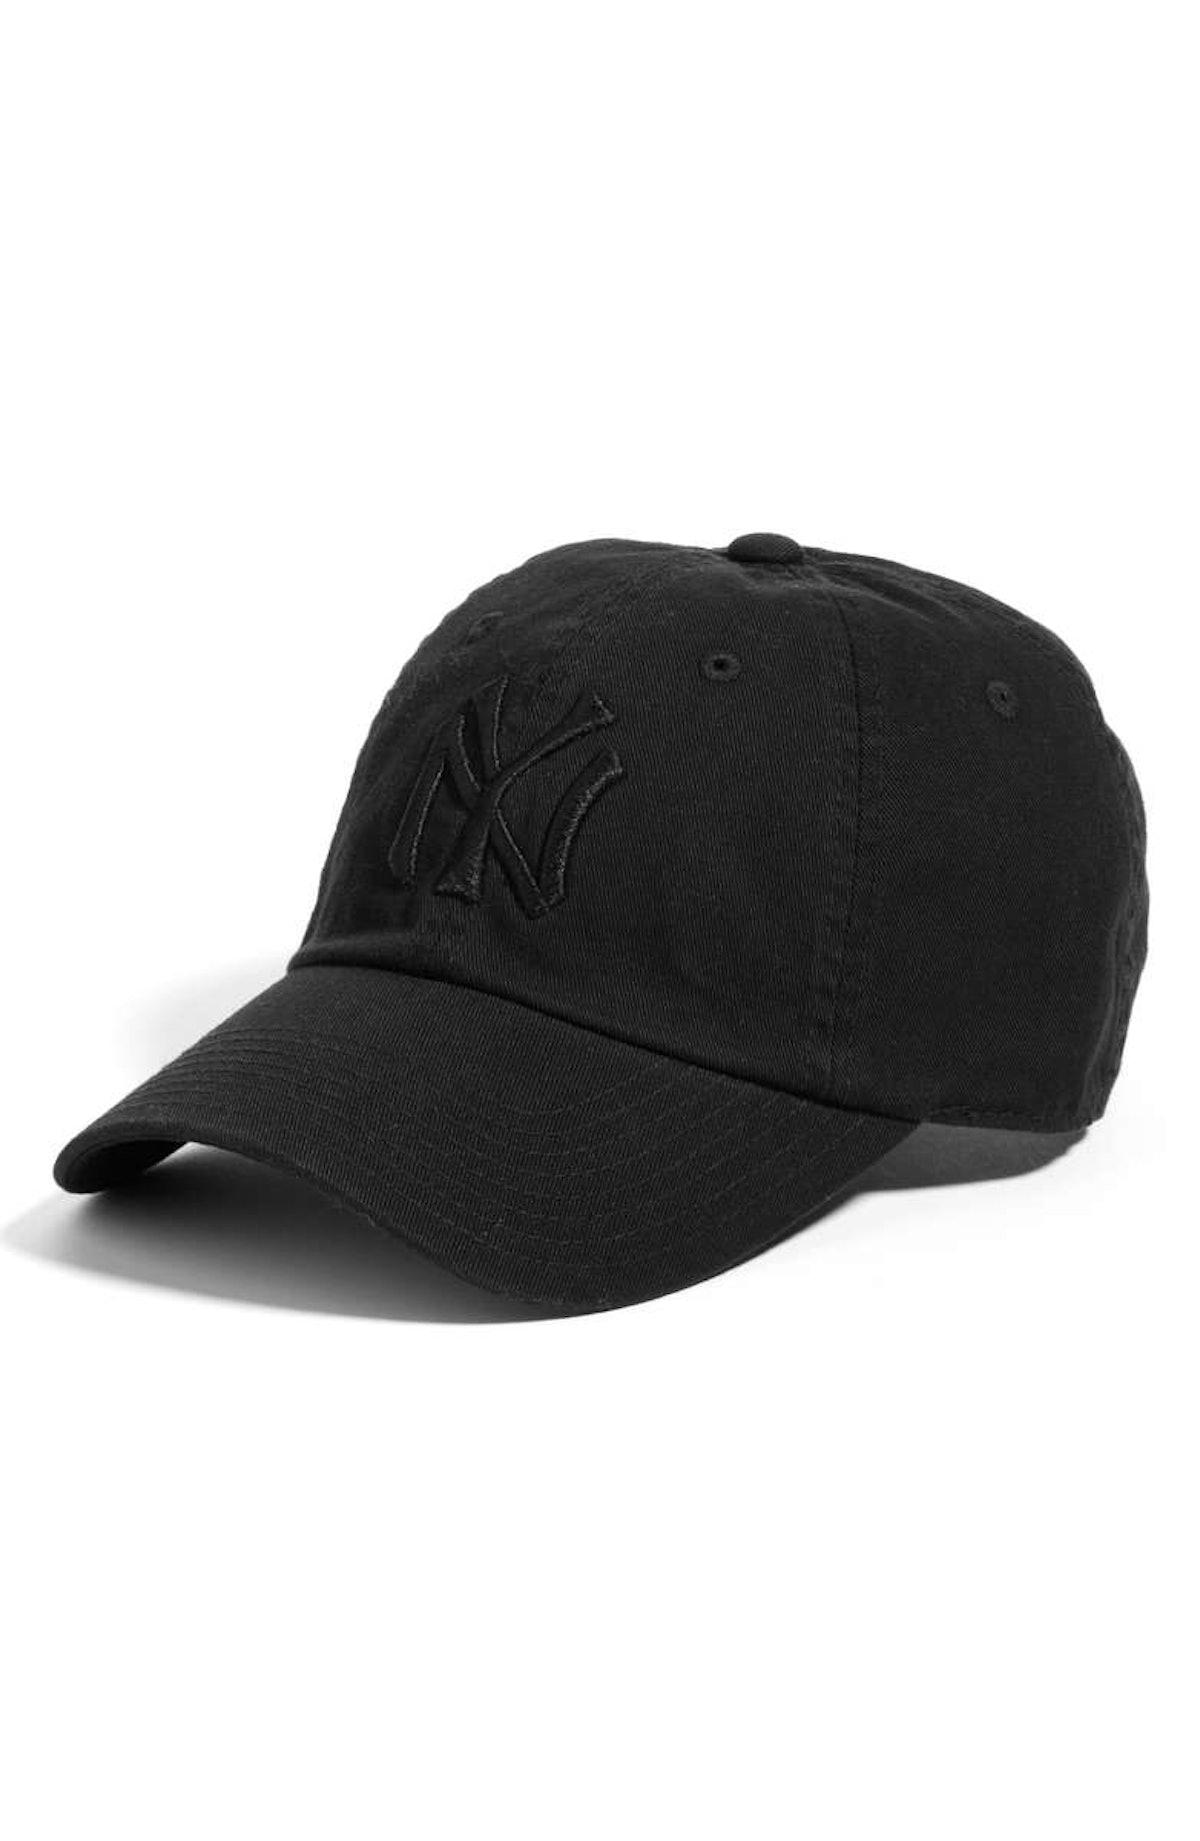 Ballpark - New York Yankees Baseball Cap